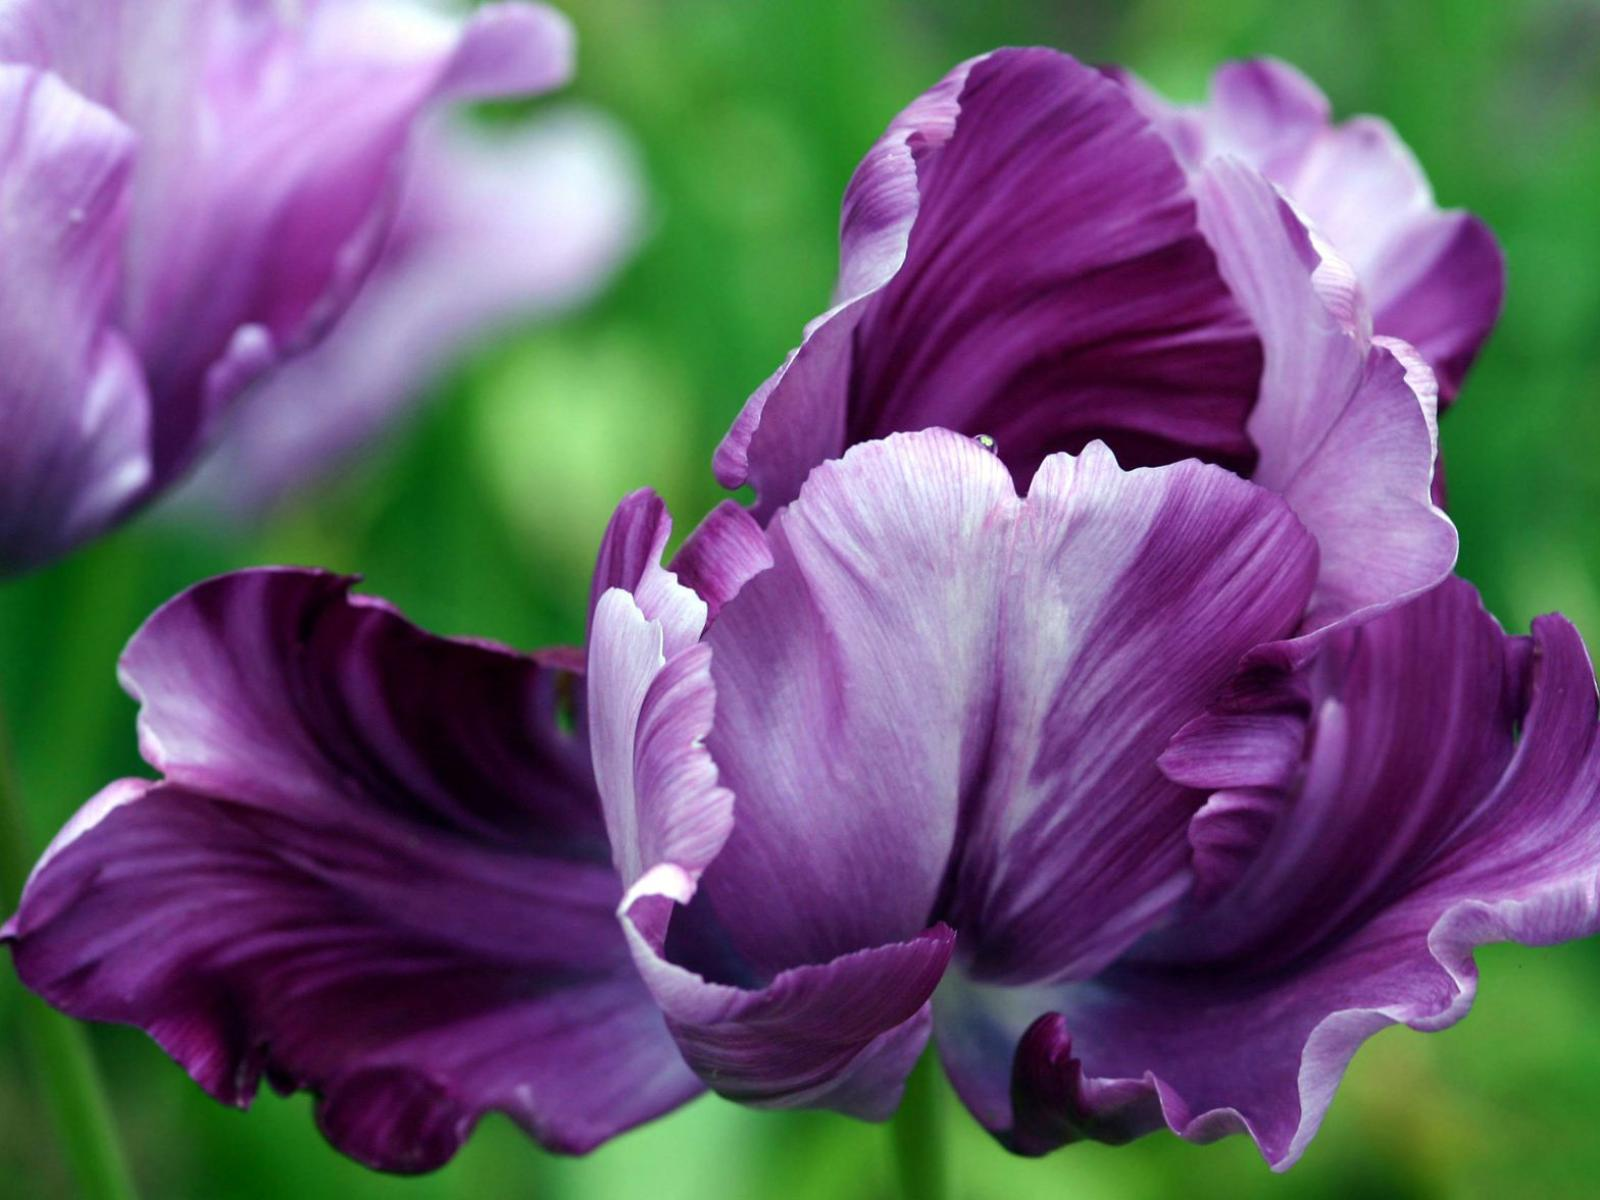 Цветы фиолетовый тюльпан цветы с